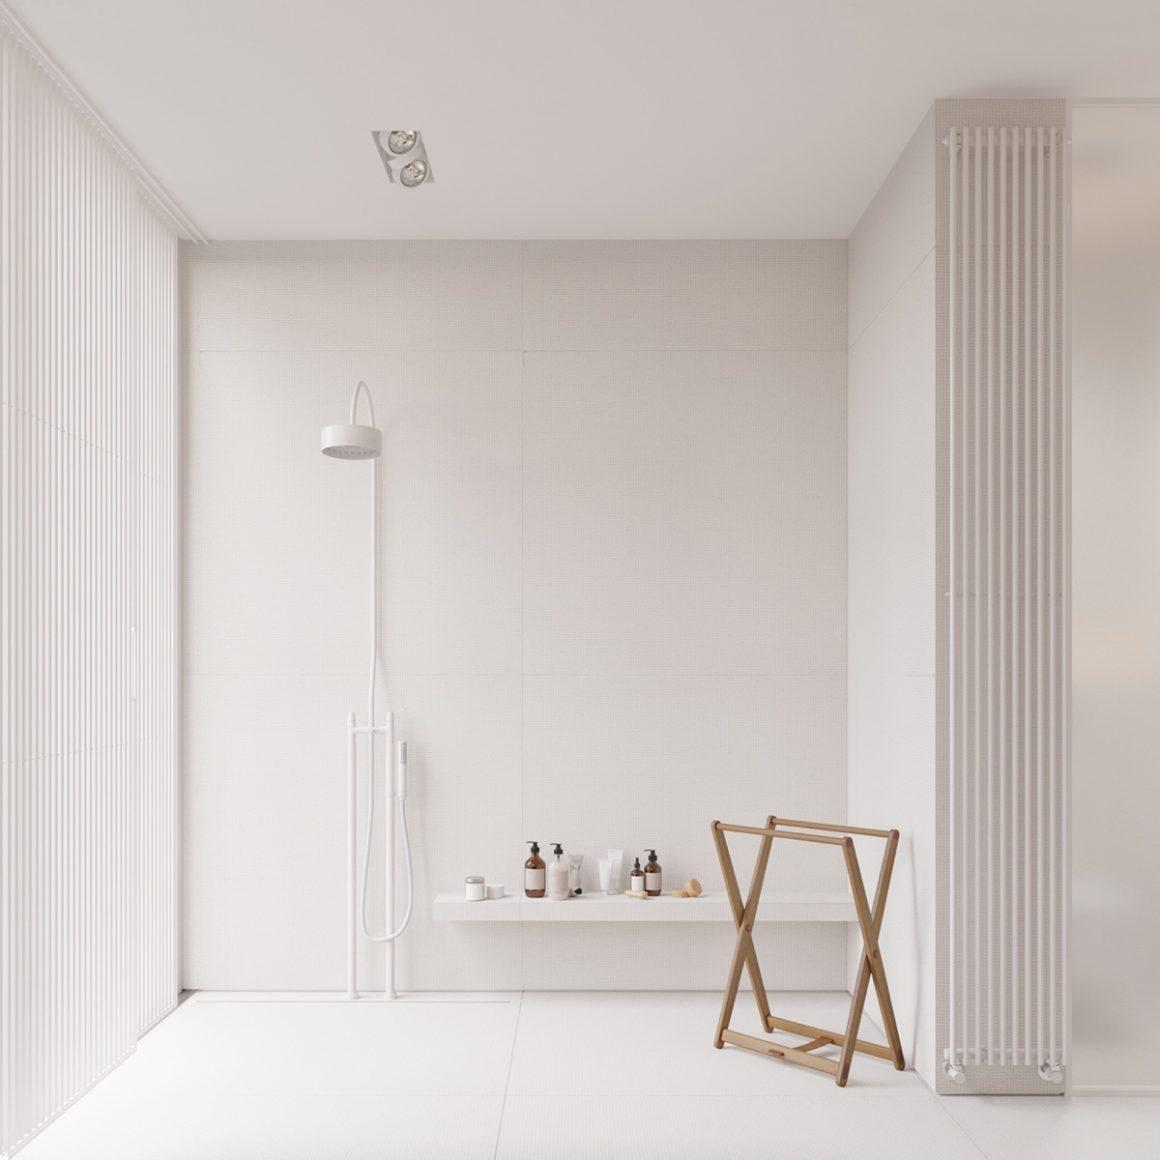 Banheiro super minimalista